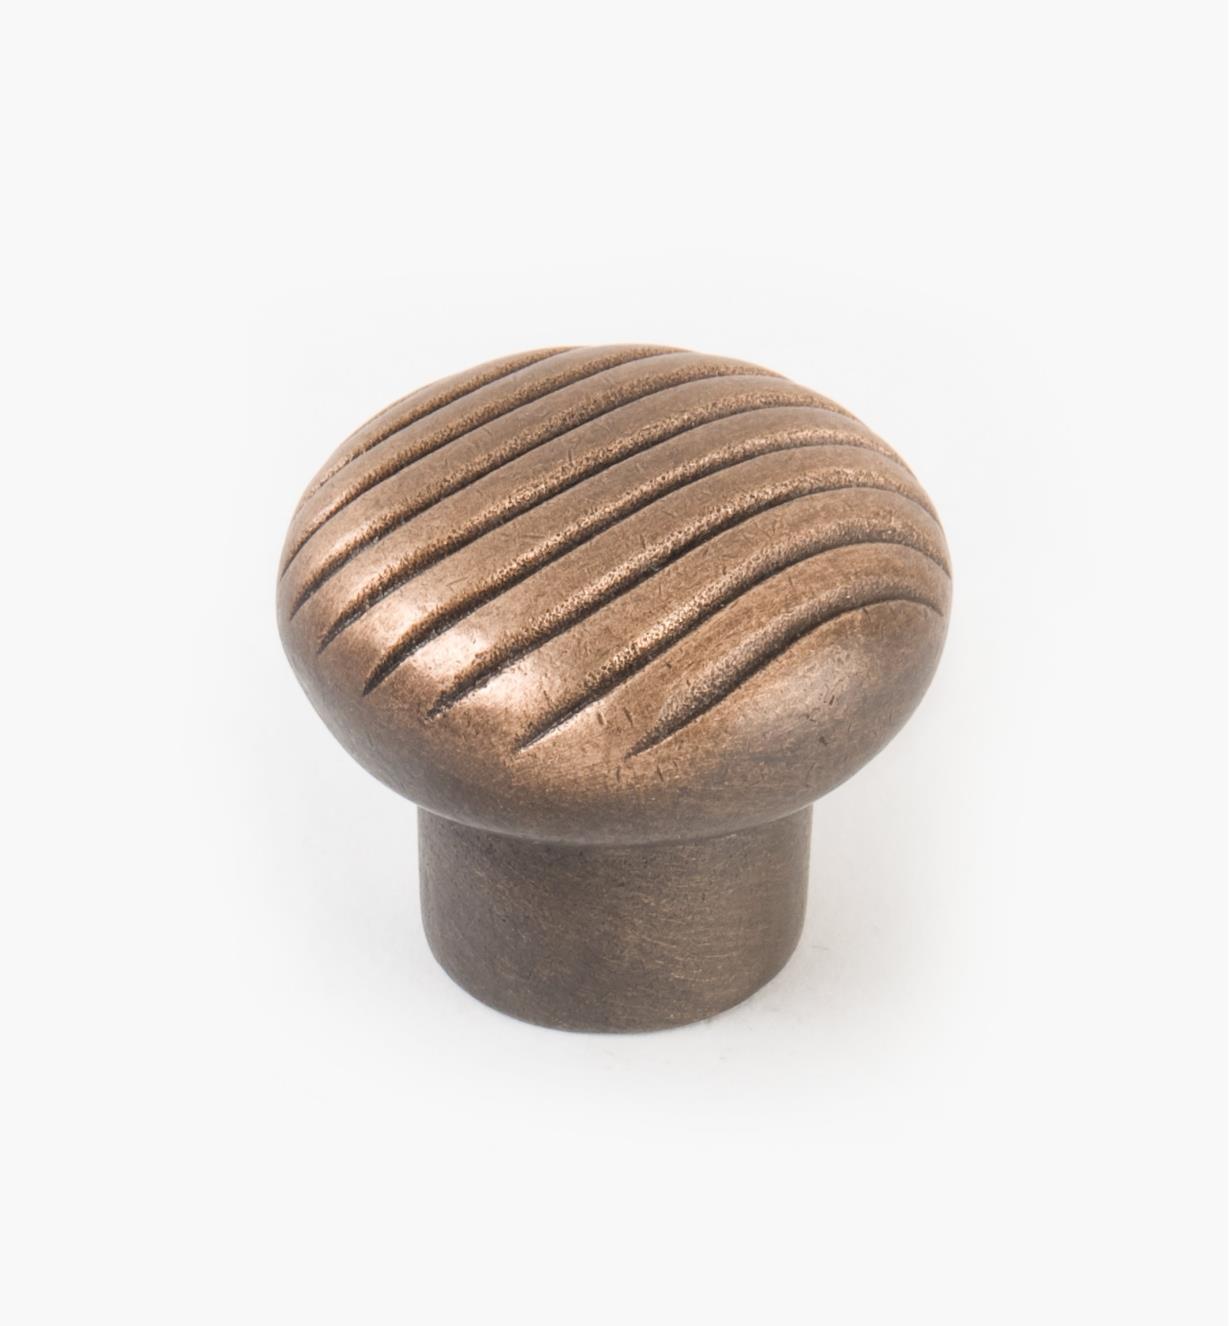 03G0342 - Bouton bombé de 15/8po x 13/8po, série Canyon, fini bronze vieilli